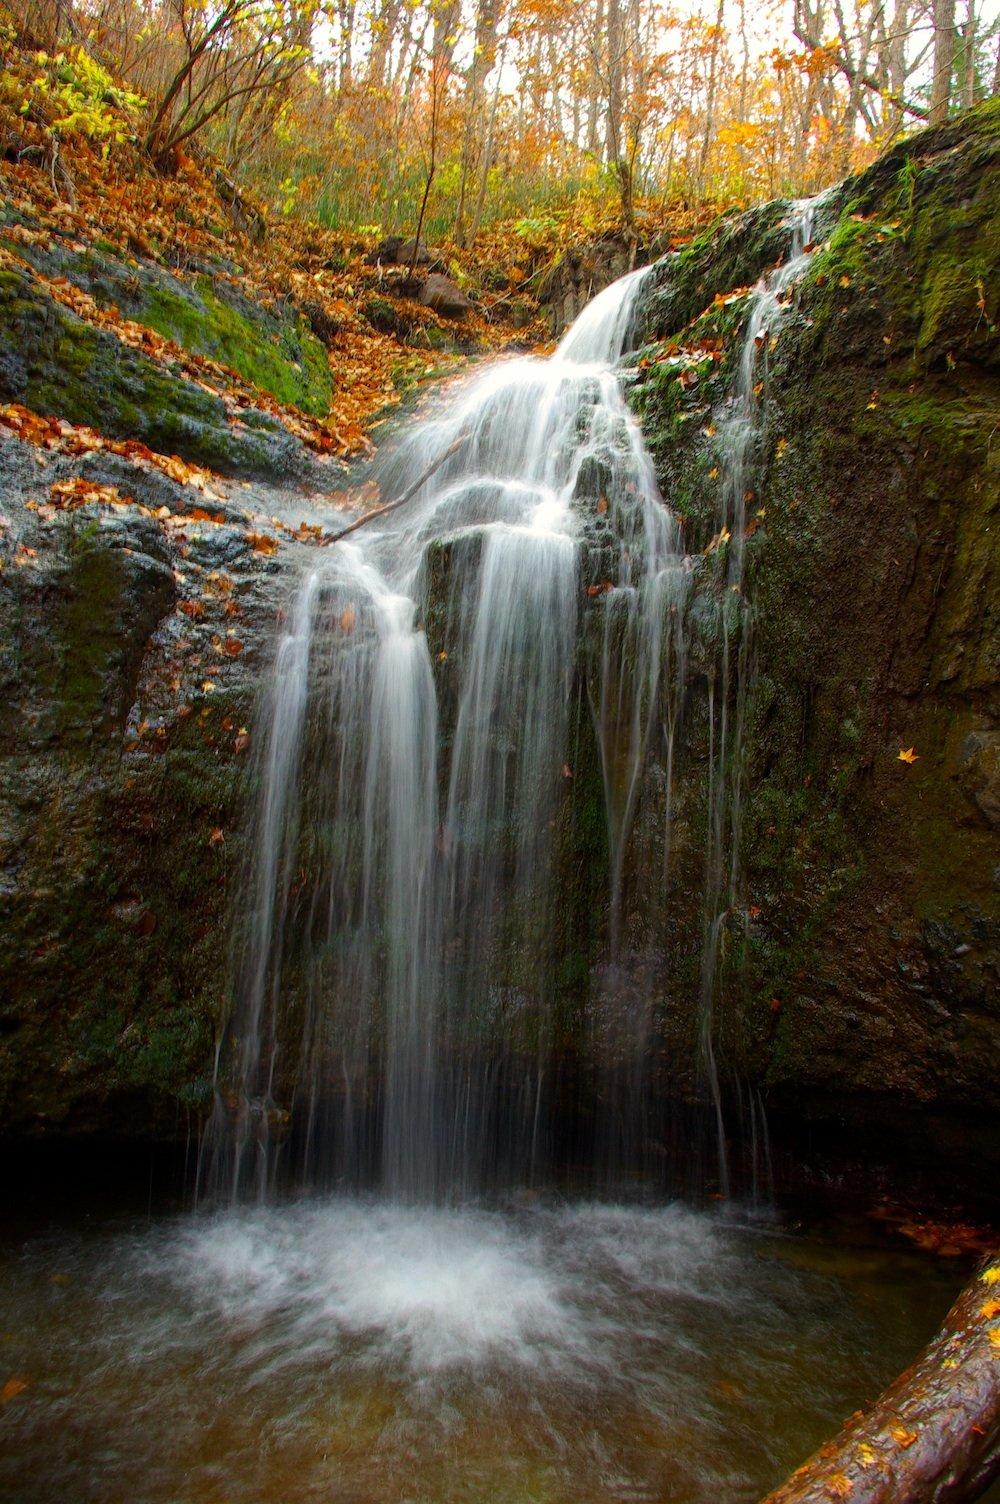 те, кто фото кравцовских водопадов практически непрерывно